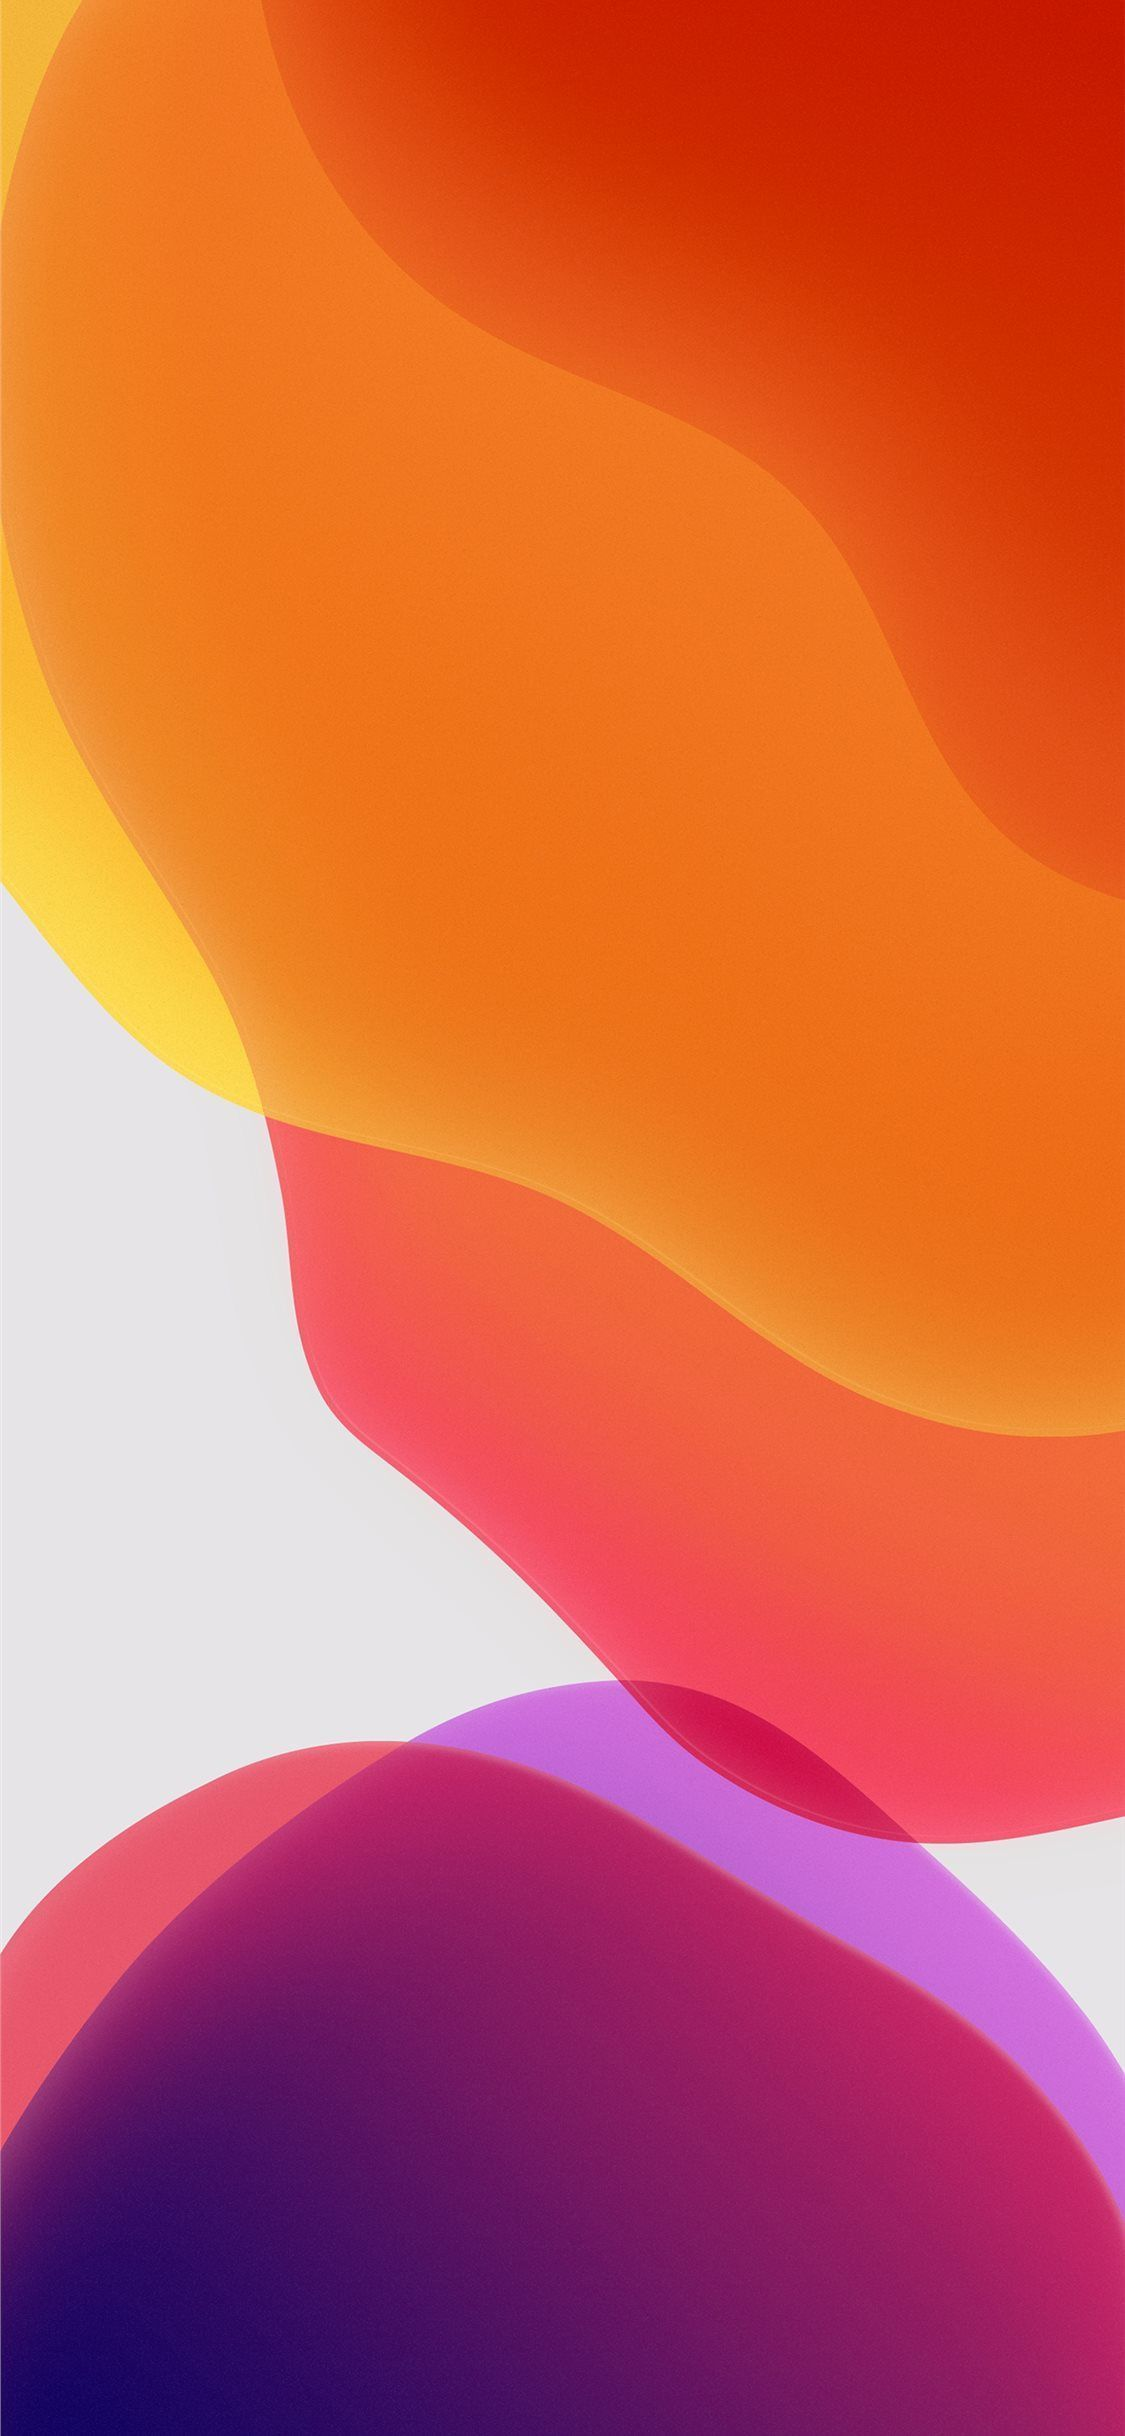 Ios 13 Wallpaper Iphone 11 Pro Ios 13 Wallpaper Ios13wallpaper In 2020 Abstract Iphone Wallpaper Original Iphone Wallpaper Iphone Wallpaper Orange